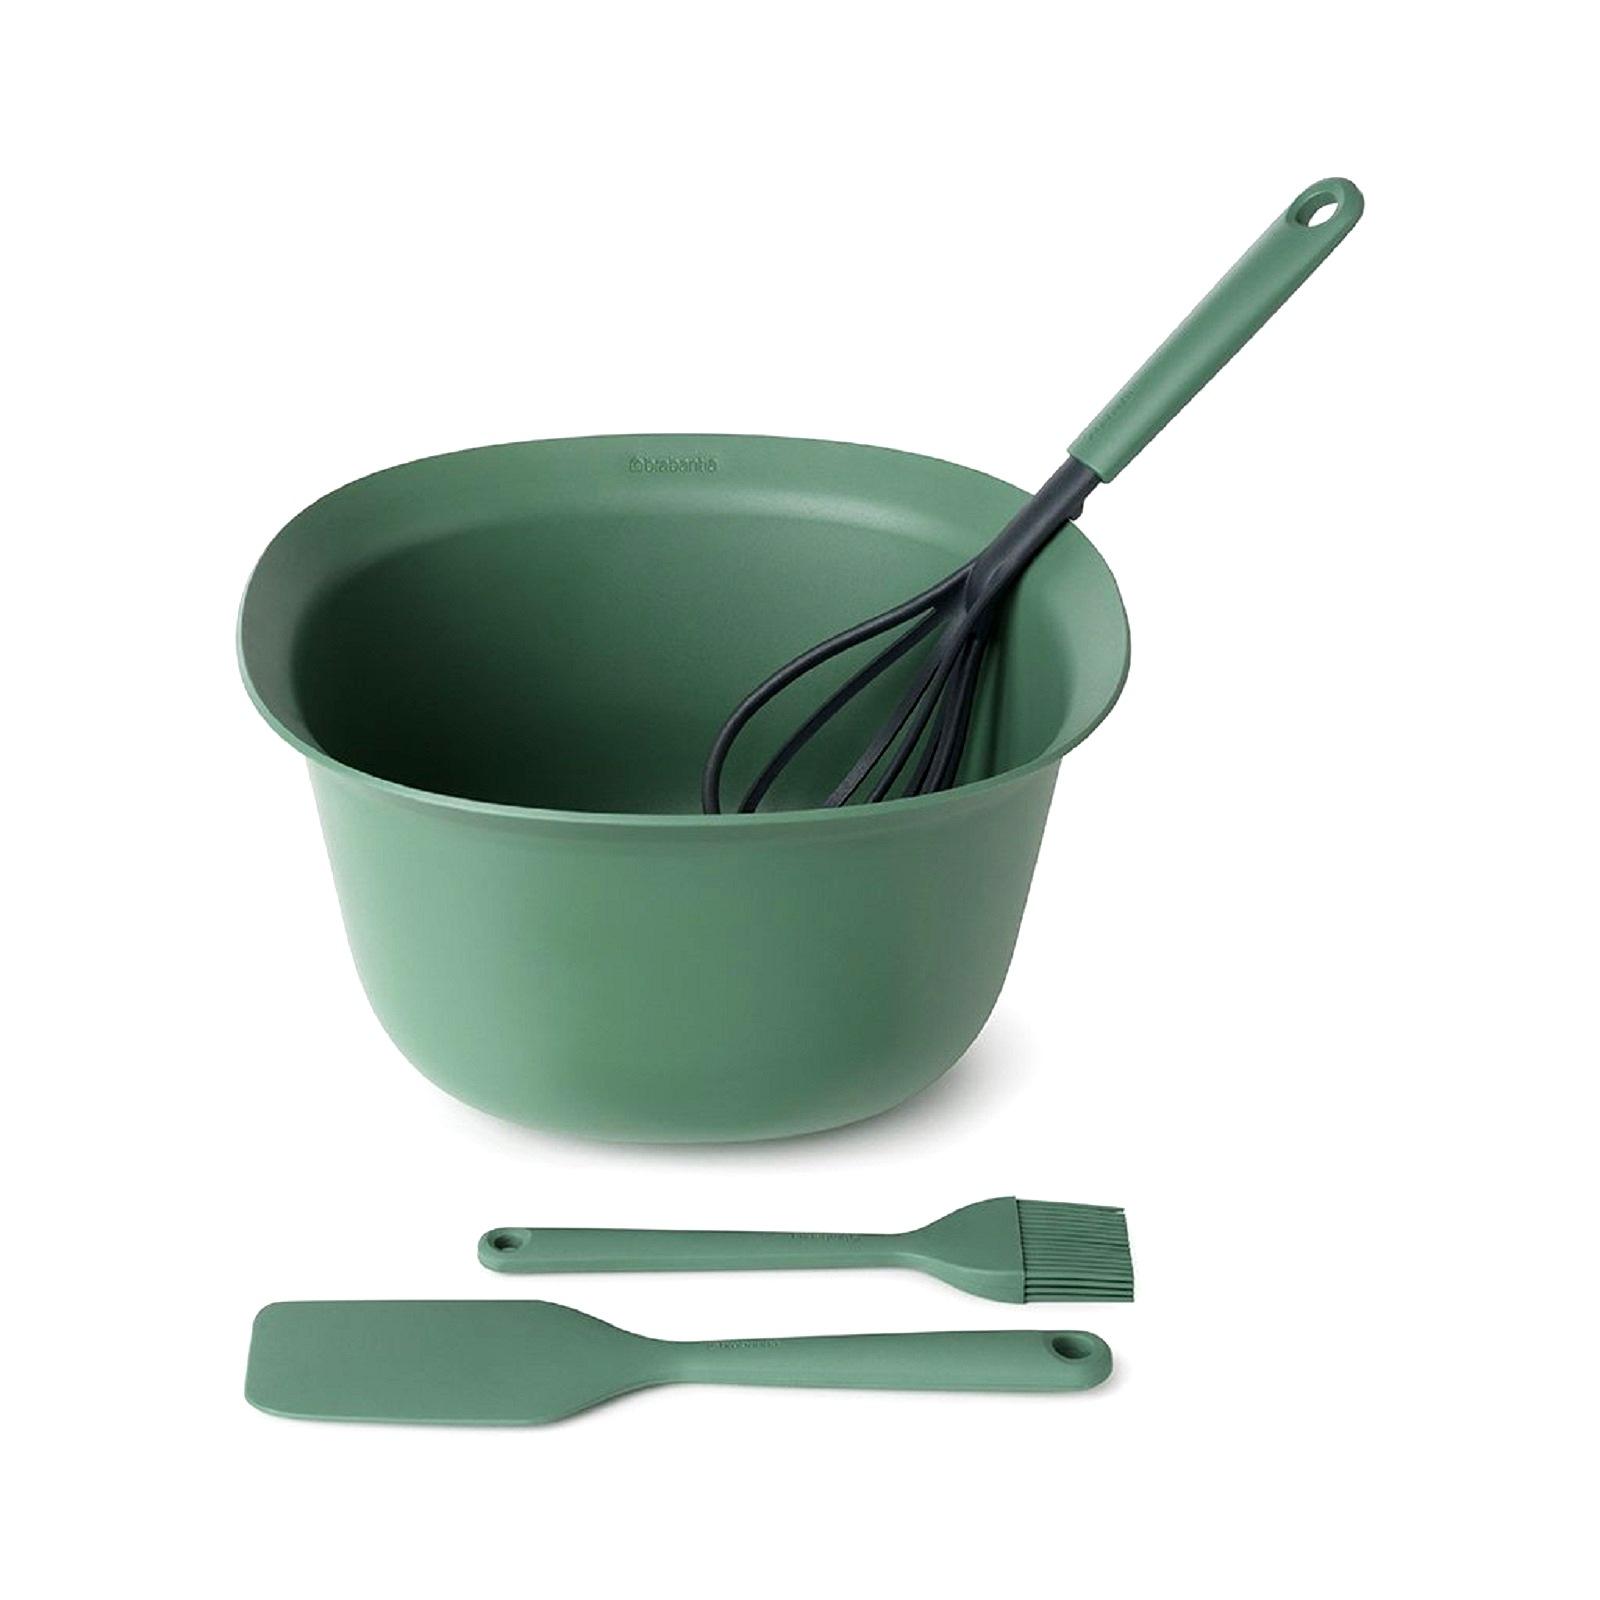 Онлайн каталог PROMENU: Набор для выпечки Brabantia TASTY+ BAKE & MIX, зеленый, 4 предмета  123207